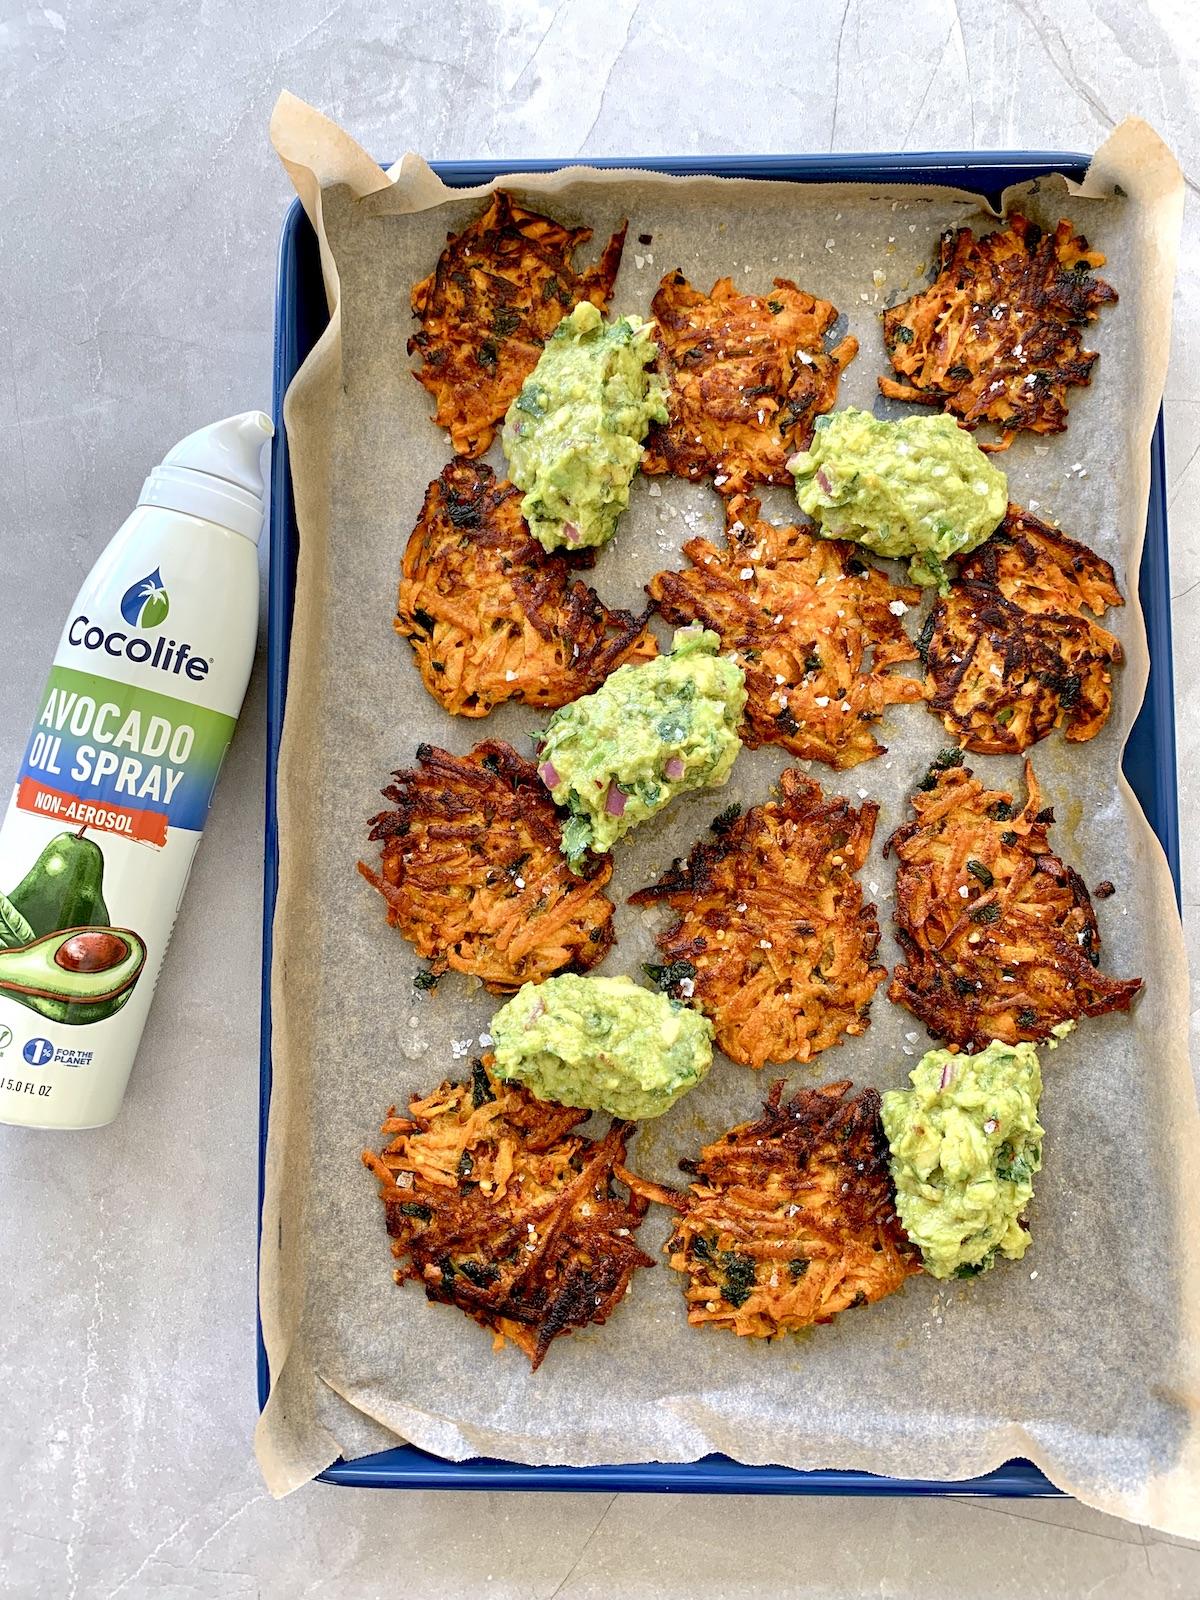 Crispy Sweet Potato Rostis | Healthy Gluten-free Vegan Recipe with Cocolife Avocado Oil Spray